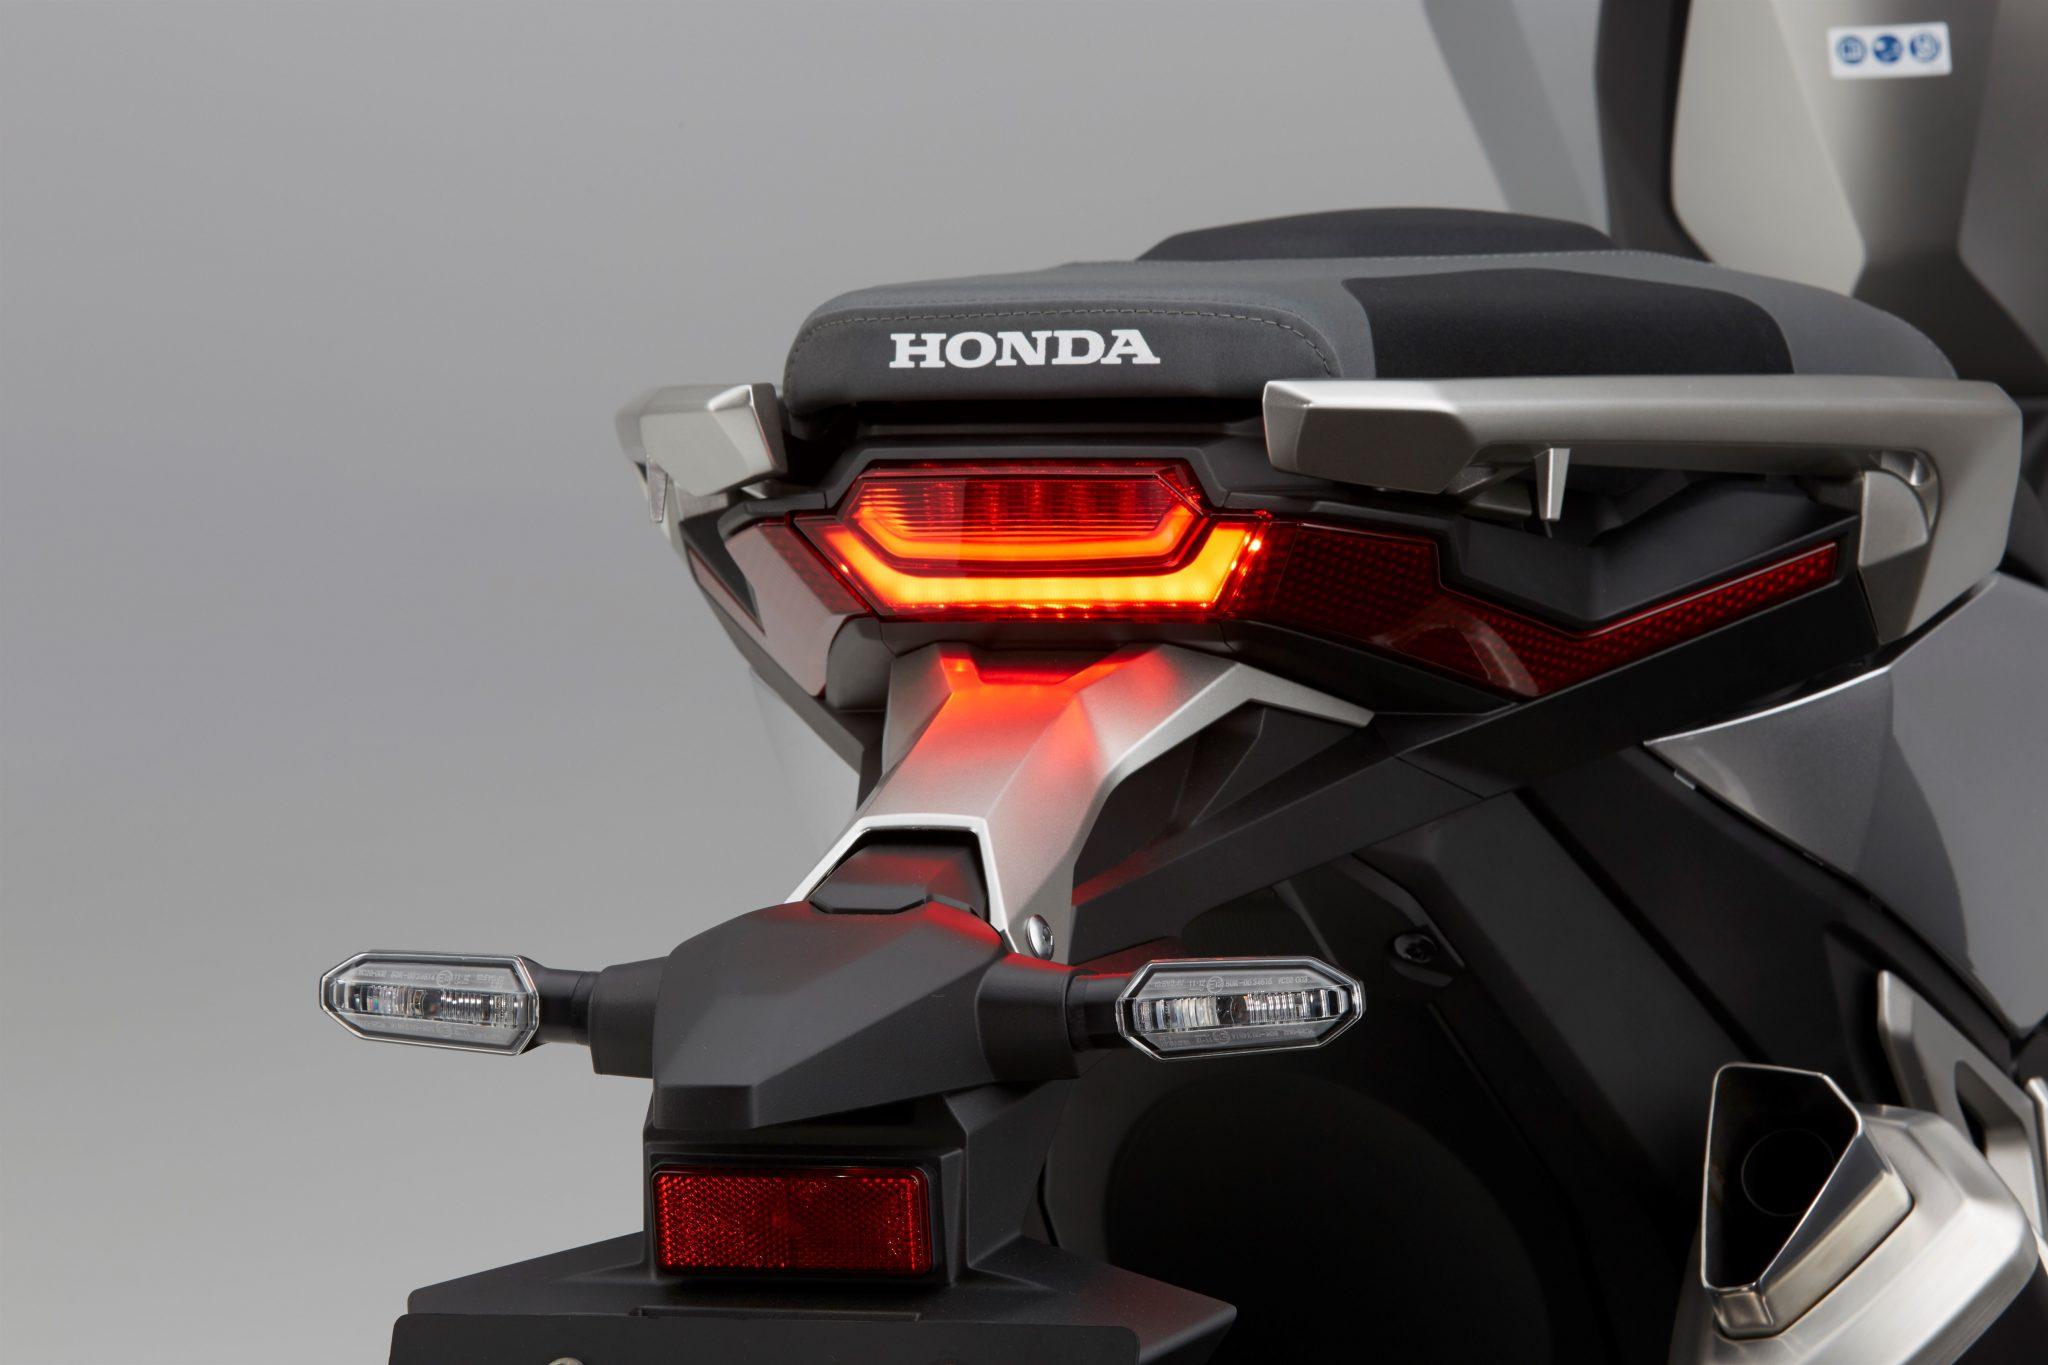 HONDA X-ADV bei Auto Stahl Rückleuchte